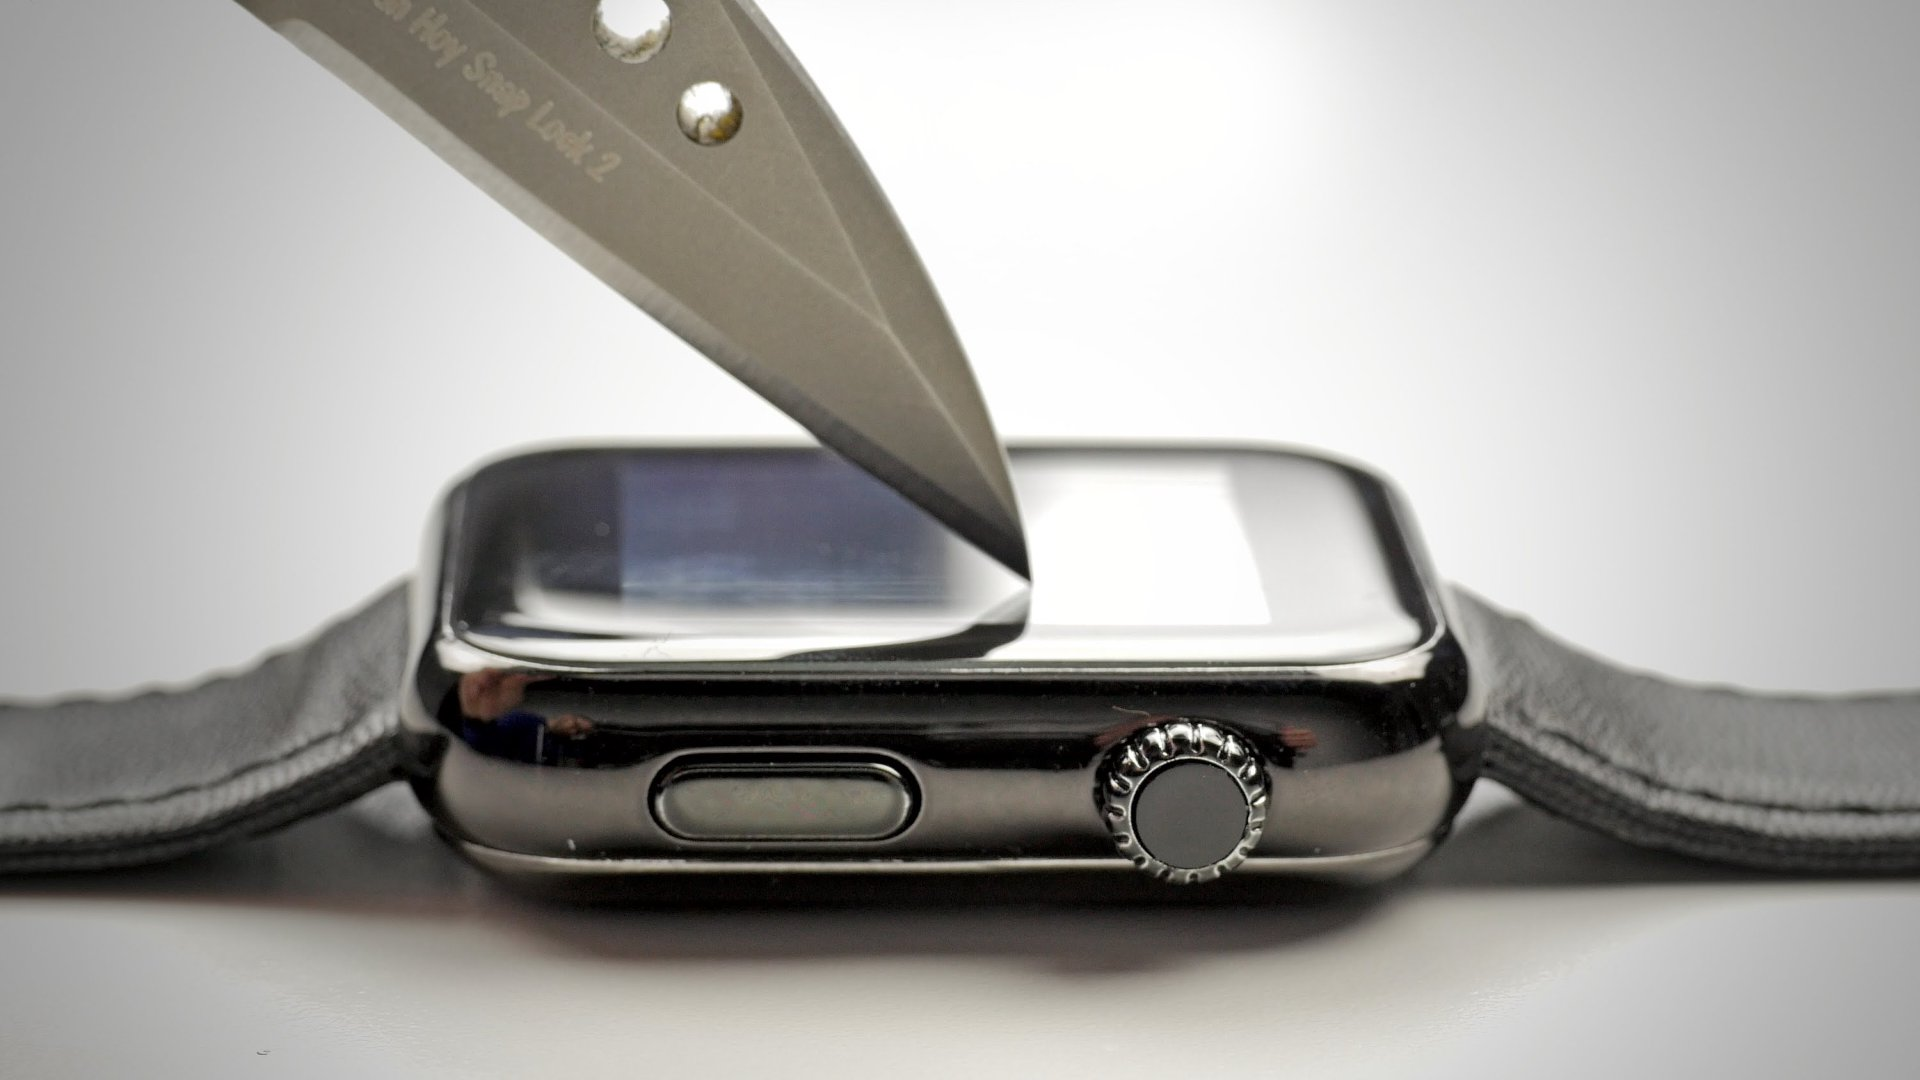 Apple Watch Scratch Resistance Test